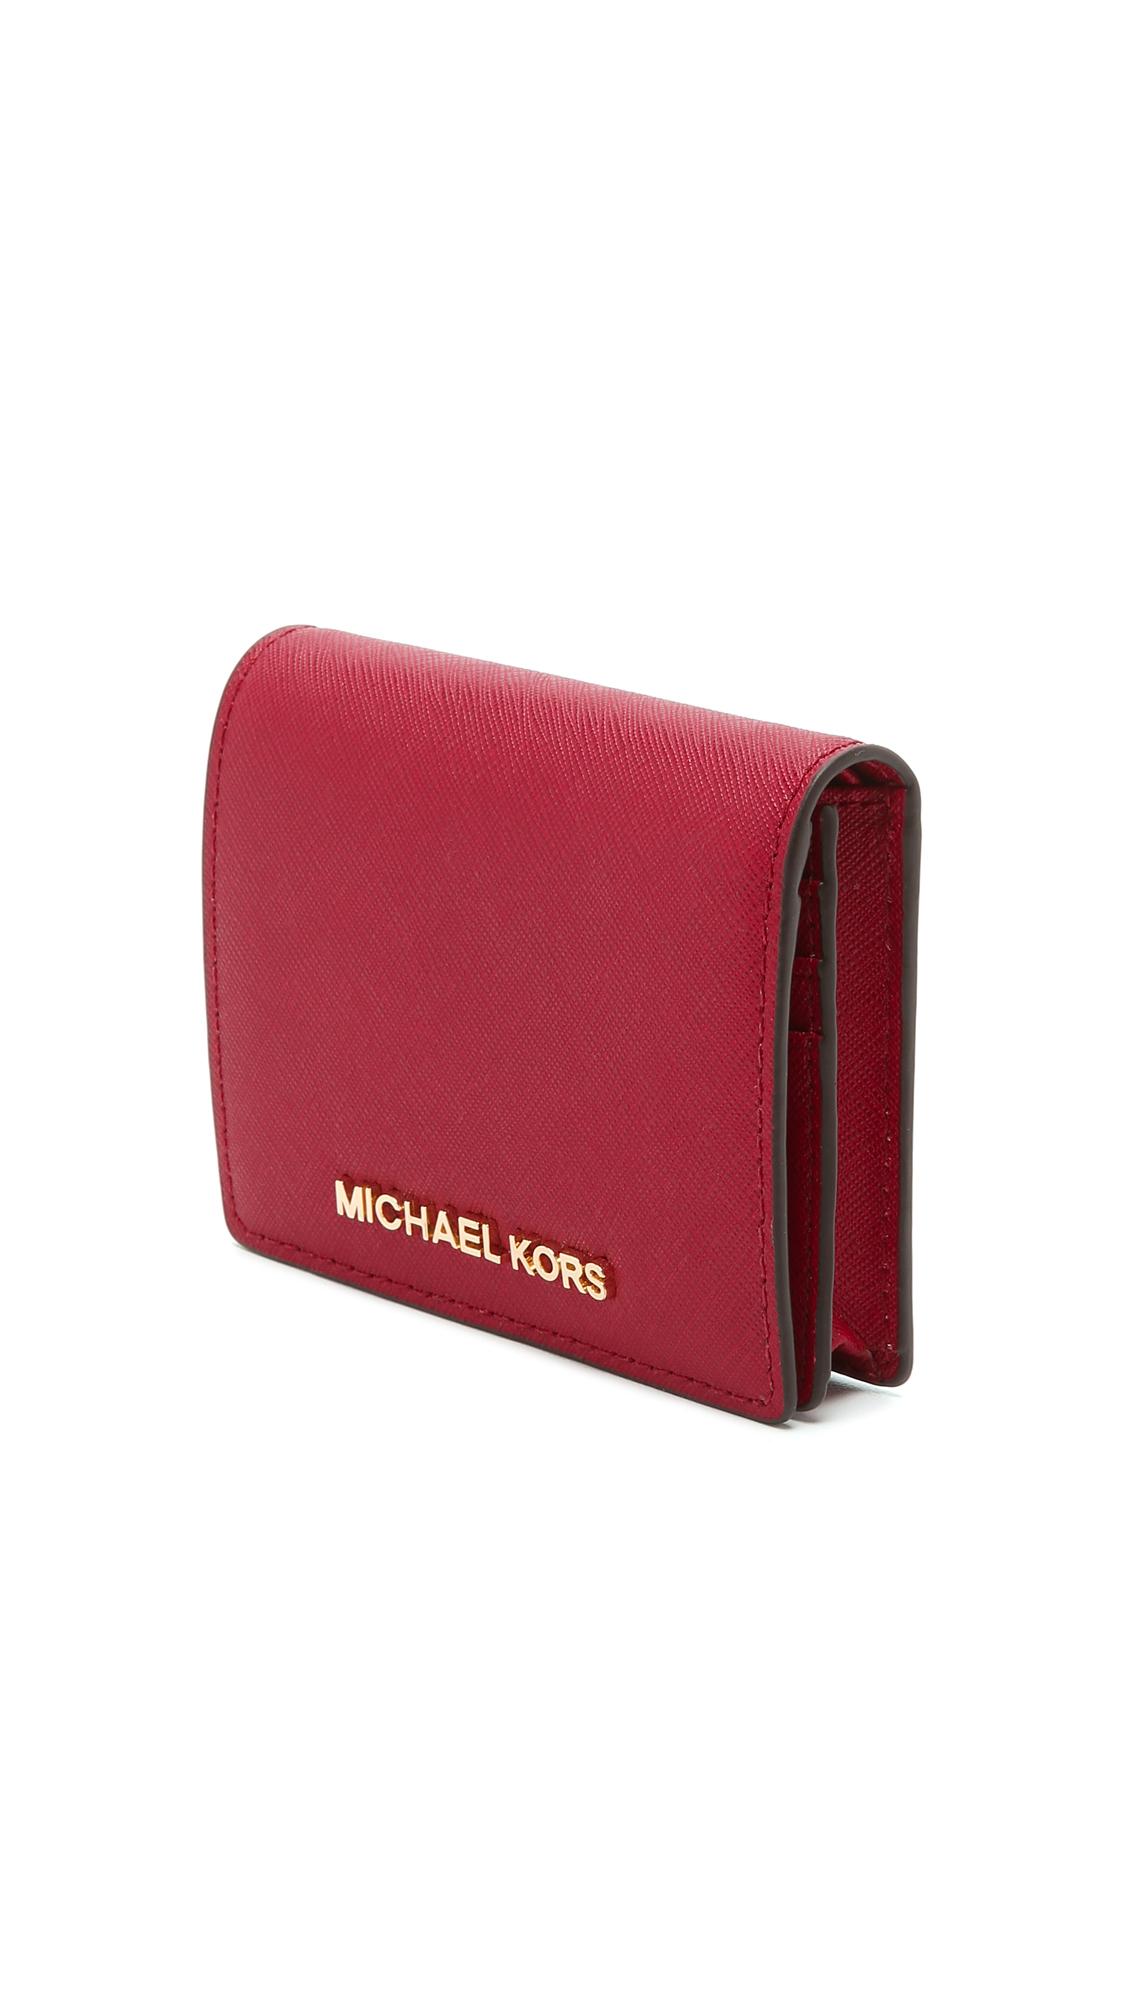 b63e18e9b699 MICHAEL Michael Kors Jet Set Bifold Wallet - Cherry in Red - Lyst